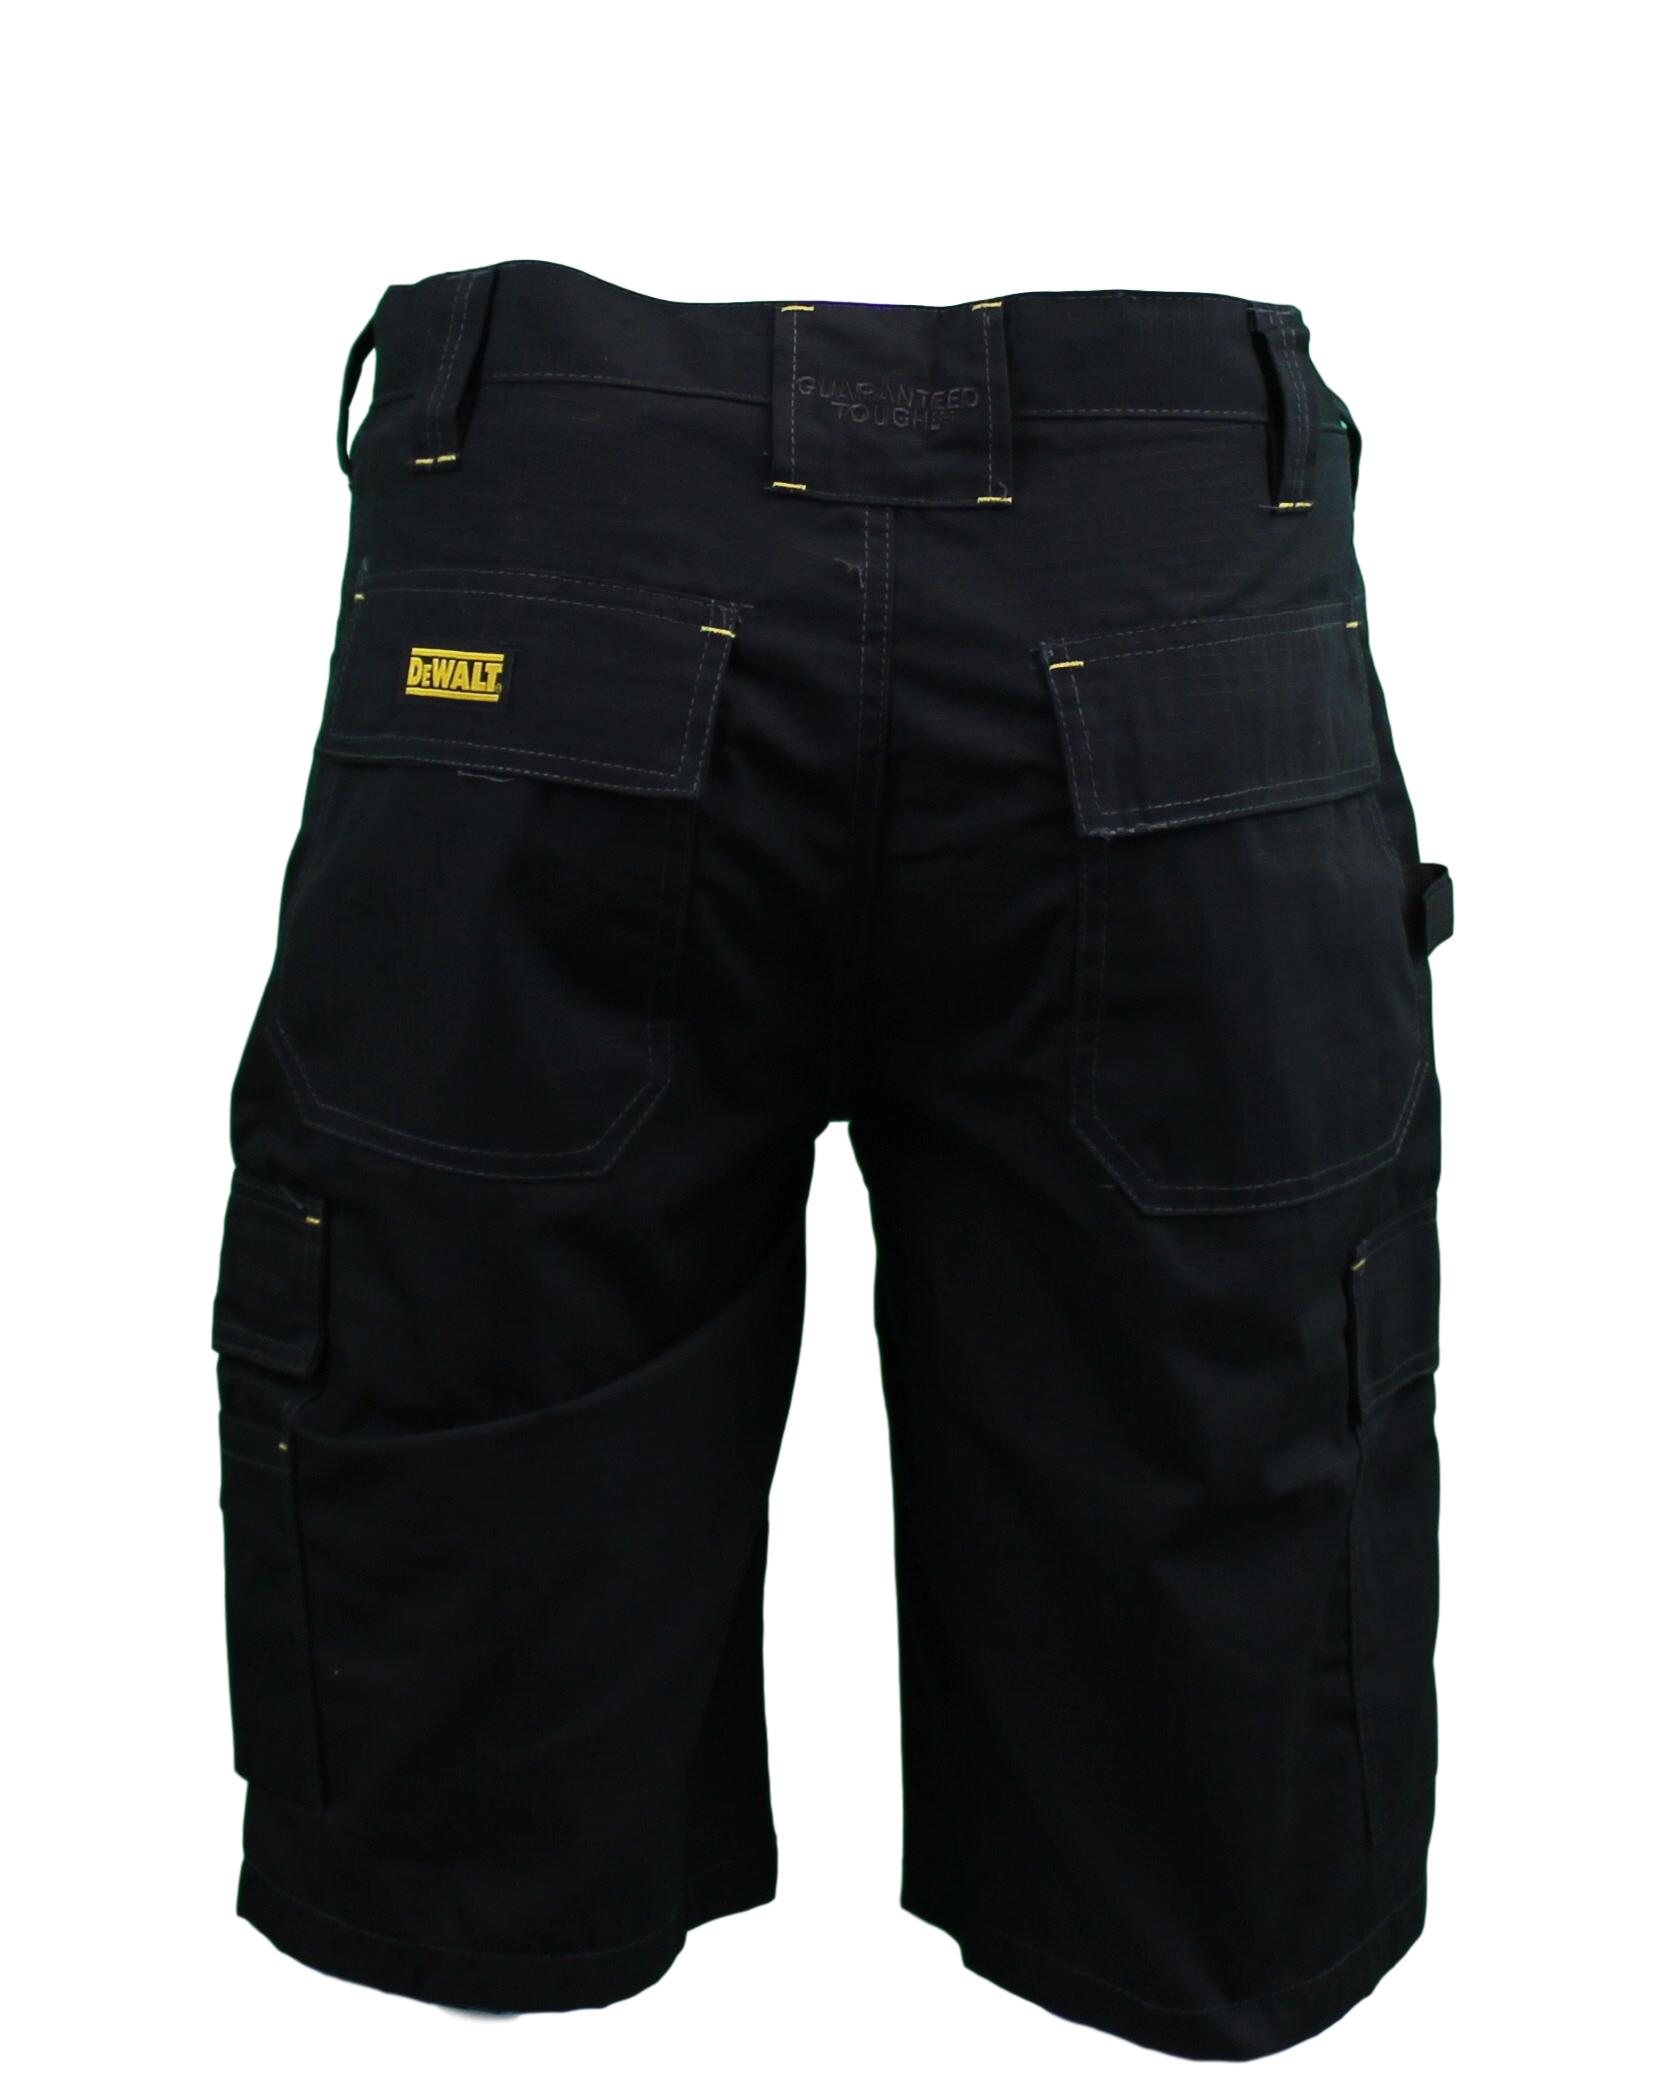 DeWalt Mens Black Utilty Pocket Cargo Work Shorts